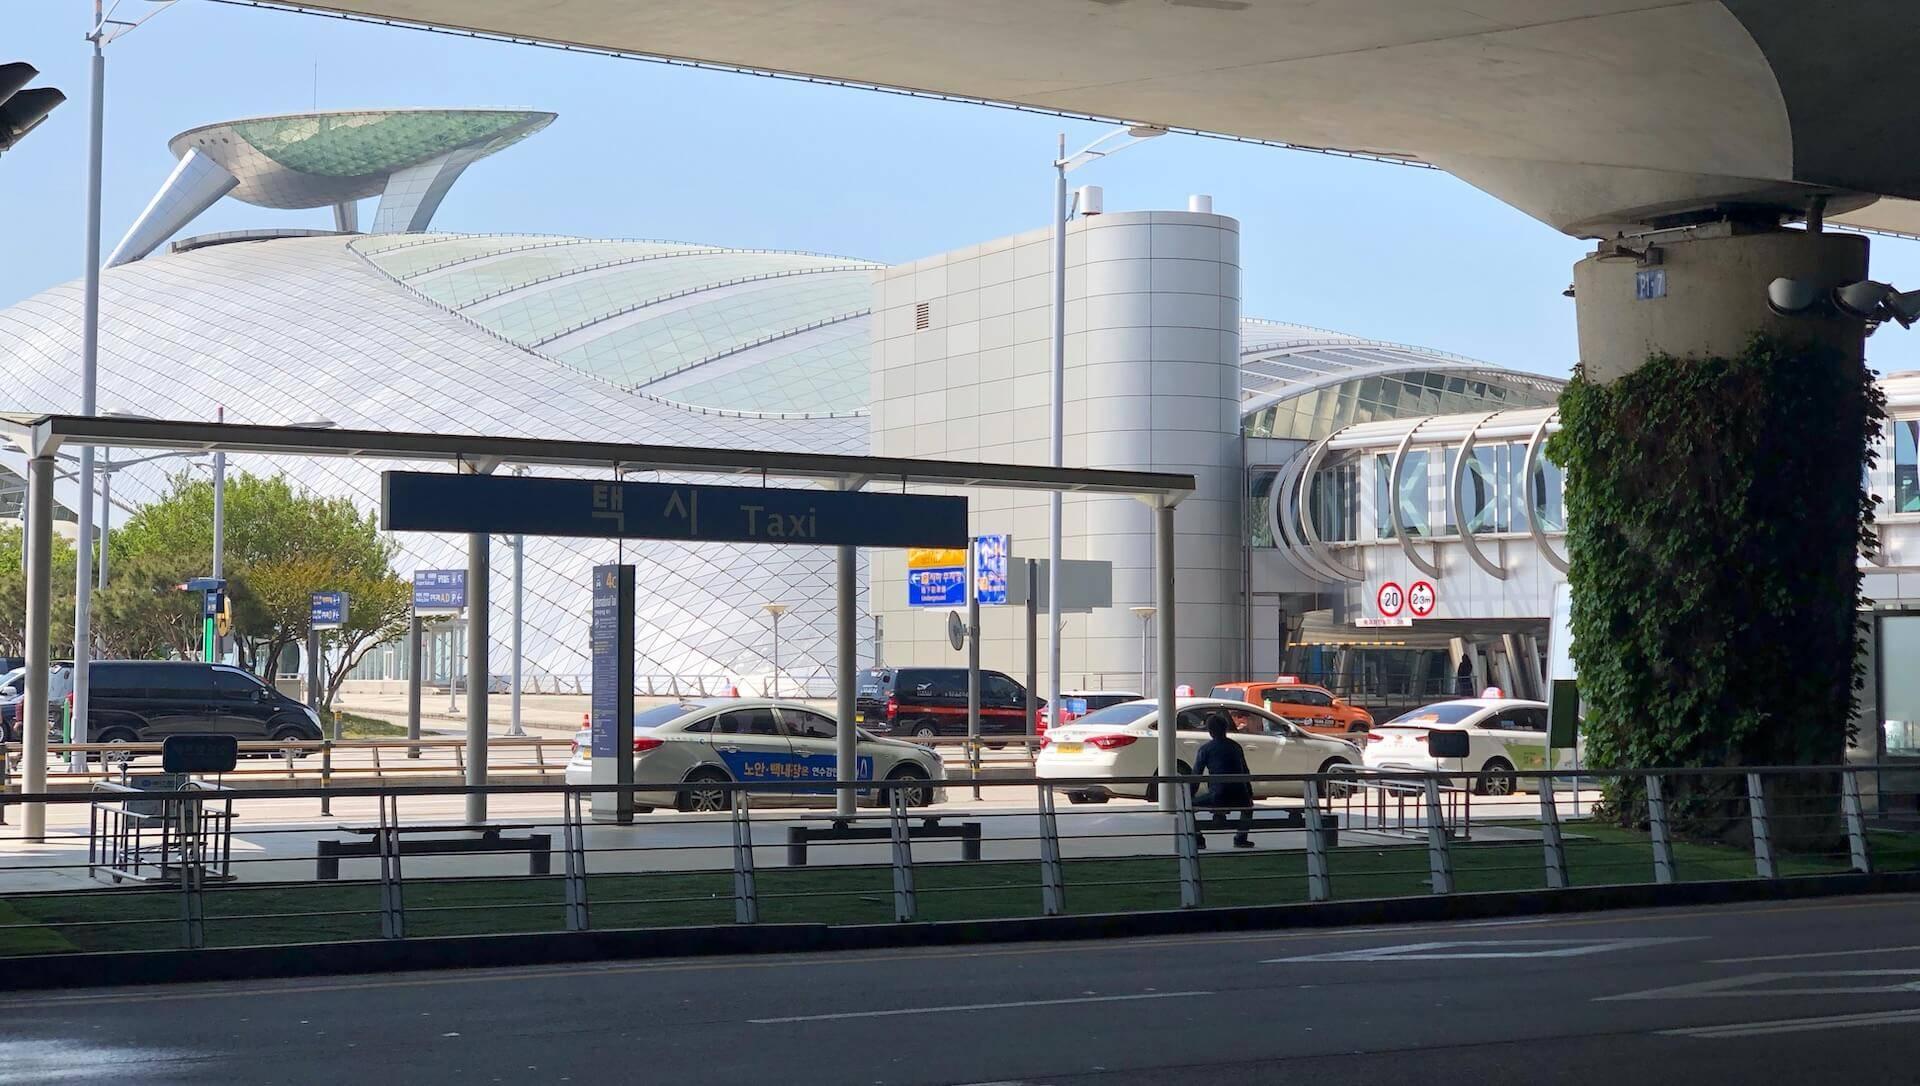 Seoul Flughafen Taxistand